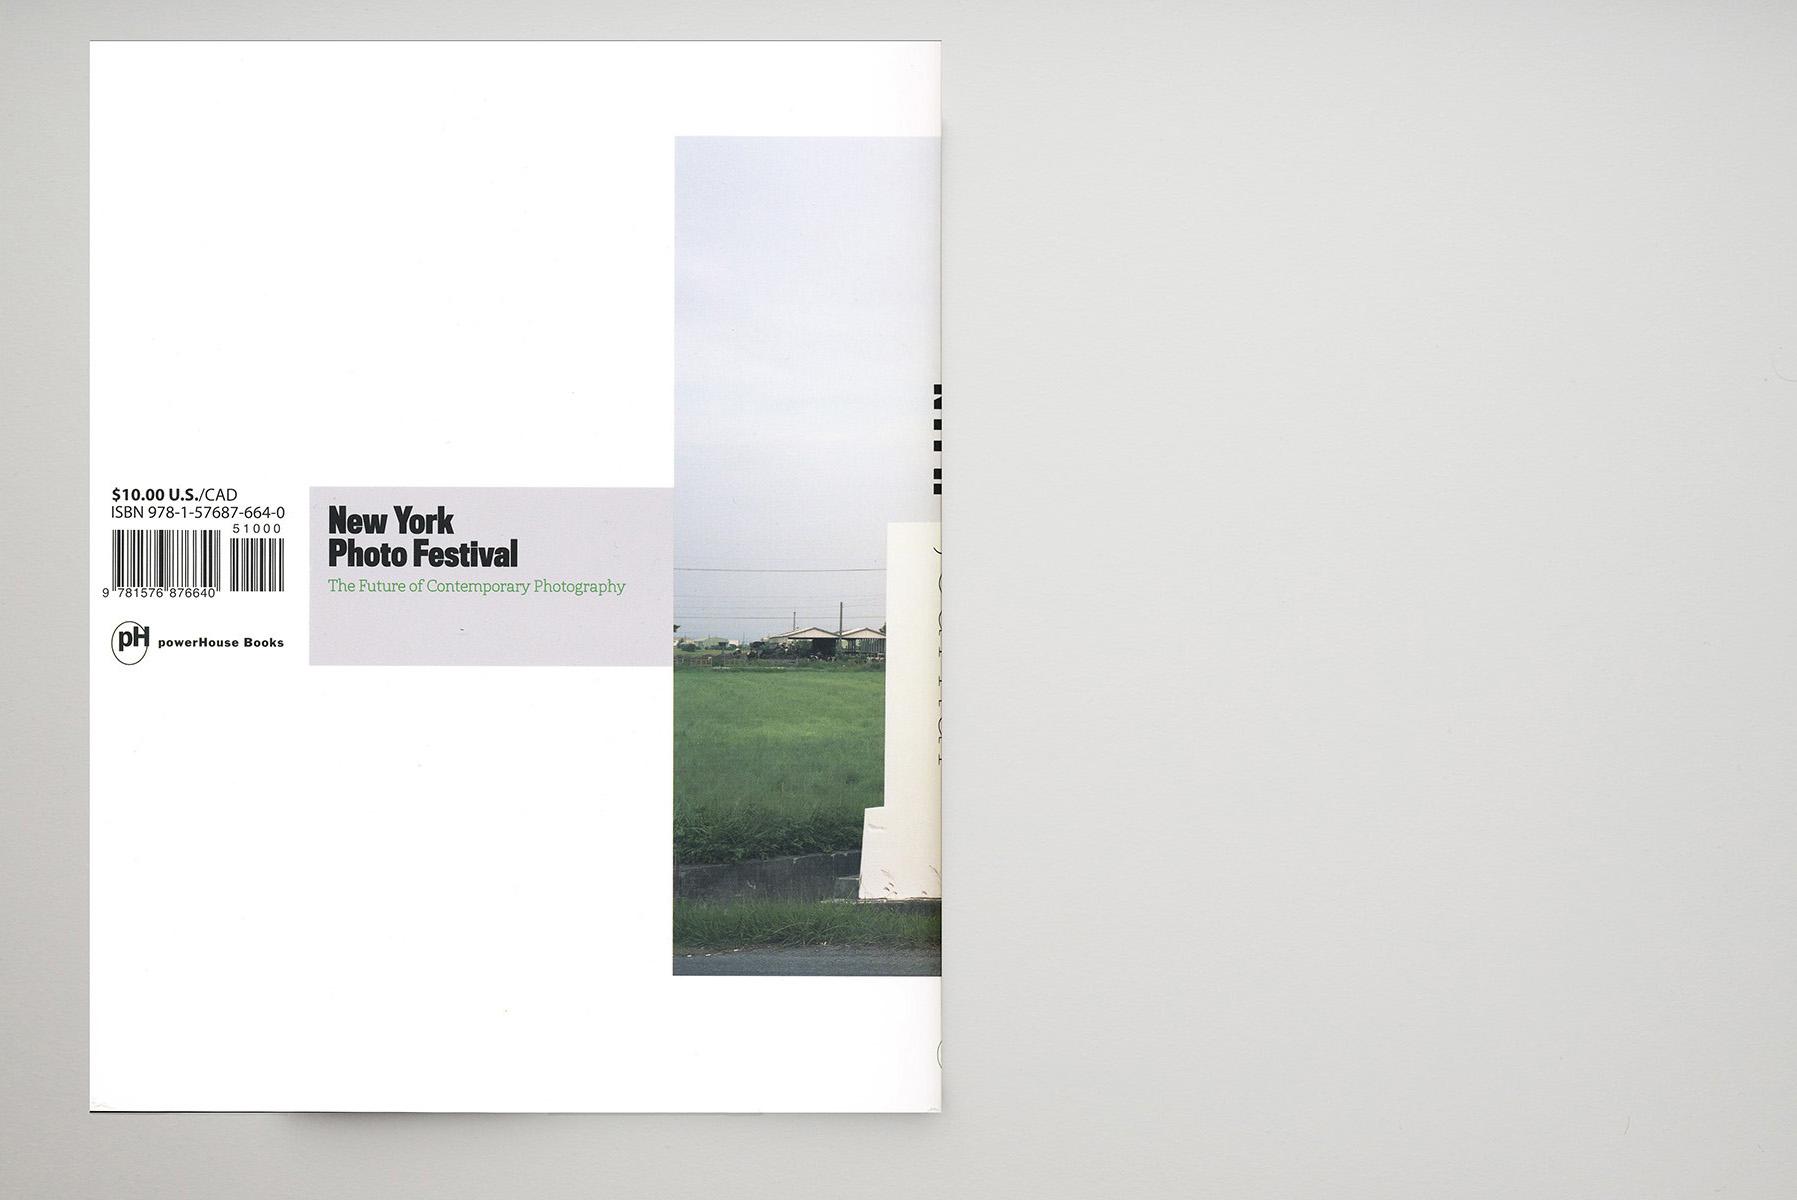 NYPH Journal powerHouse Books, New York, Chris Drange, Christoph David Drange